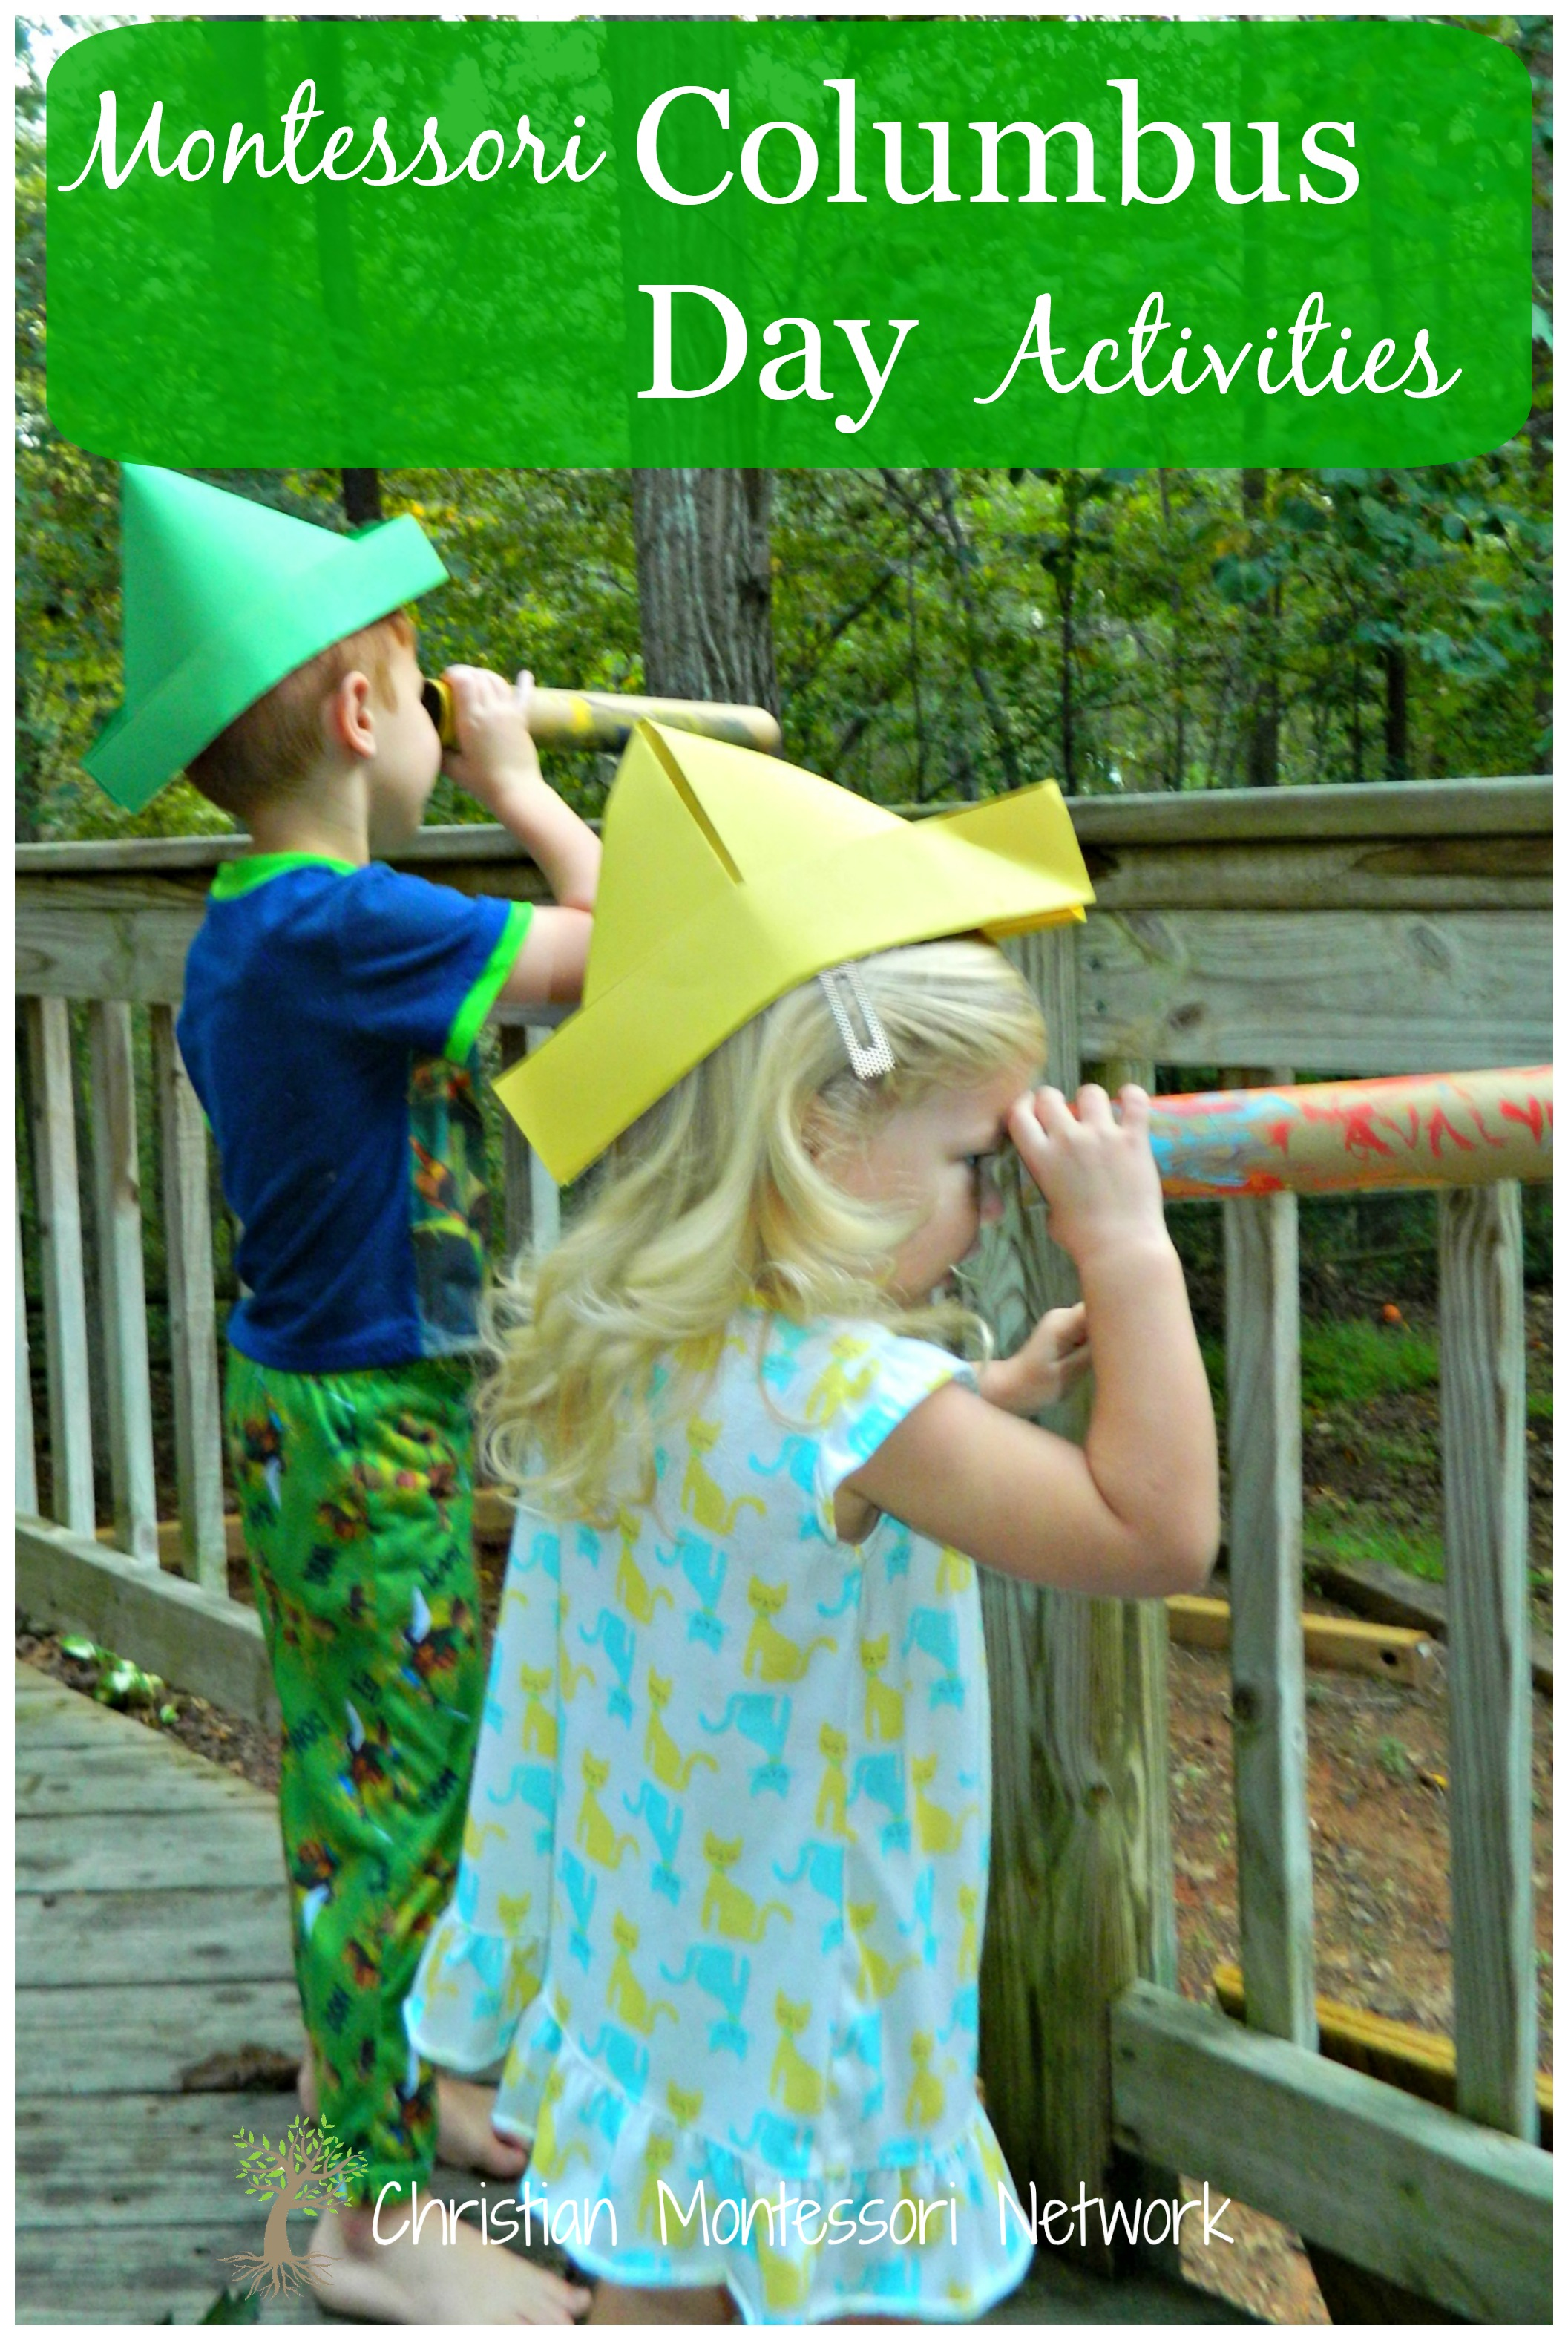 Montessori Columbus Day Activities